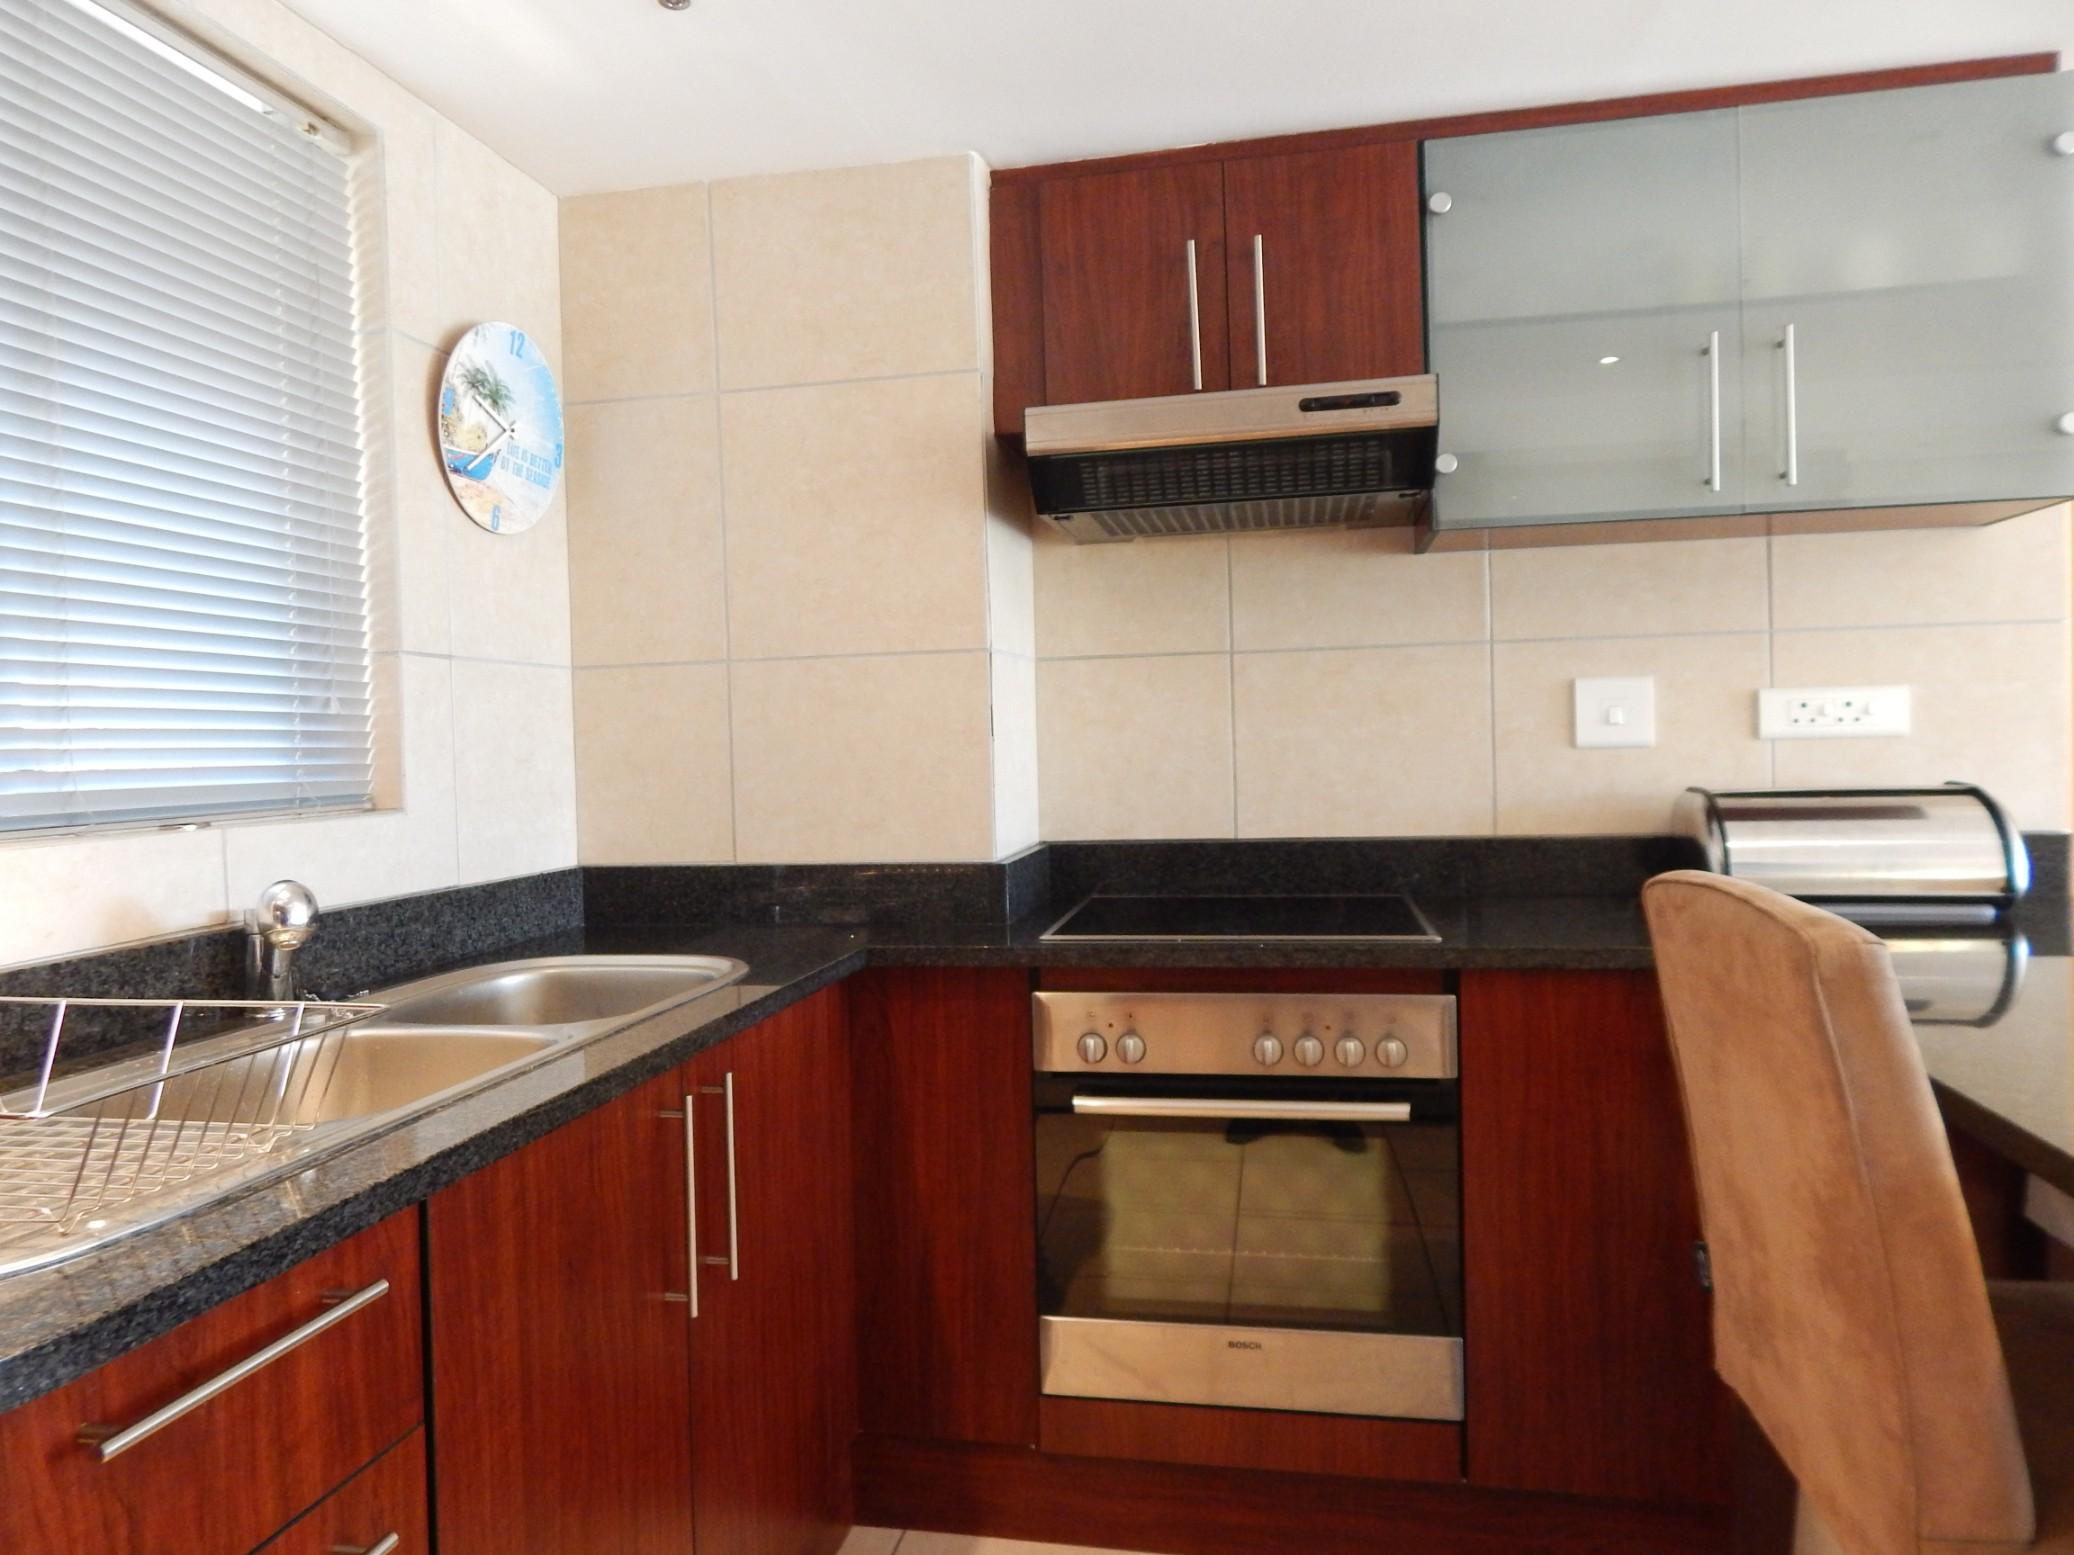 2 Bedroom Apartment for sale in De Bakke ENT0067862 : photo#14